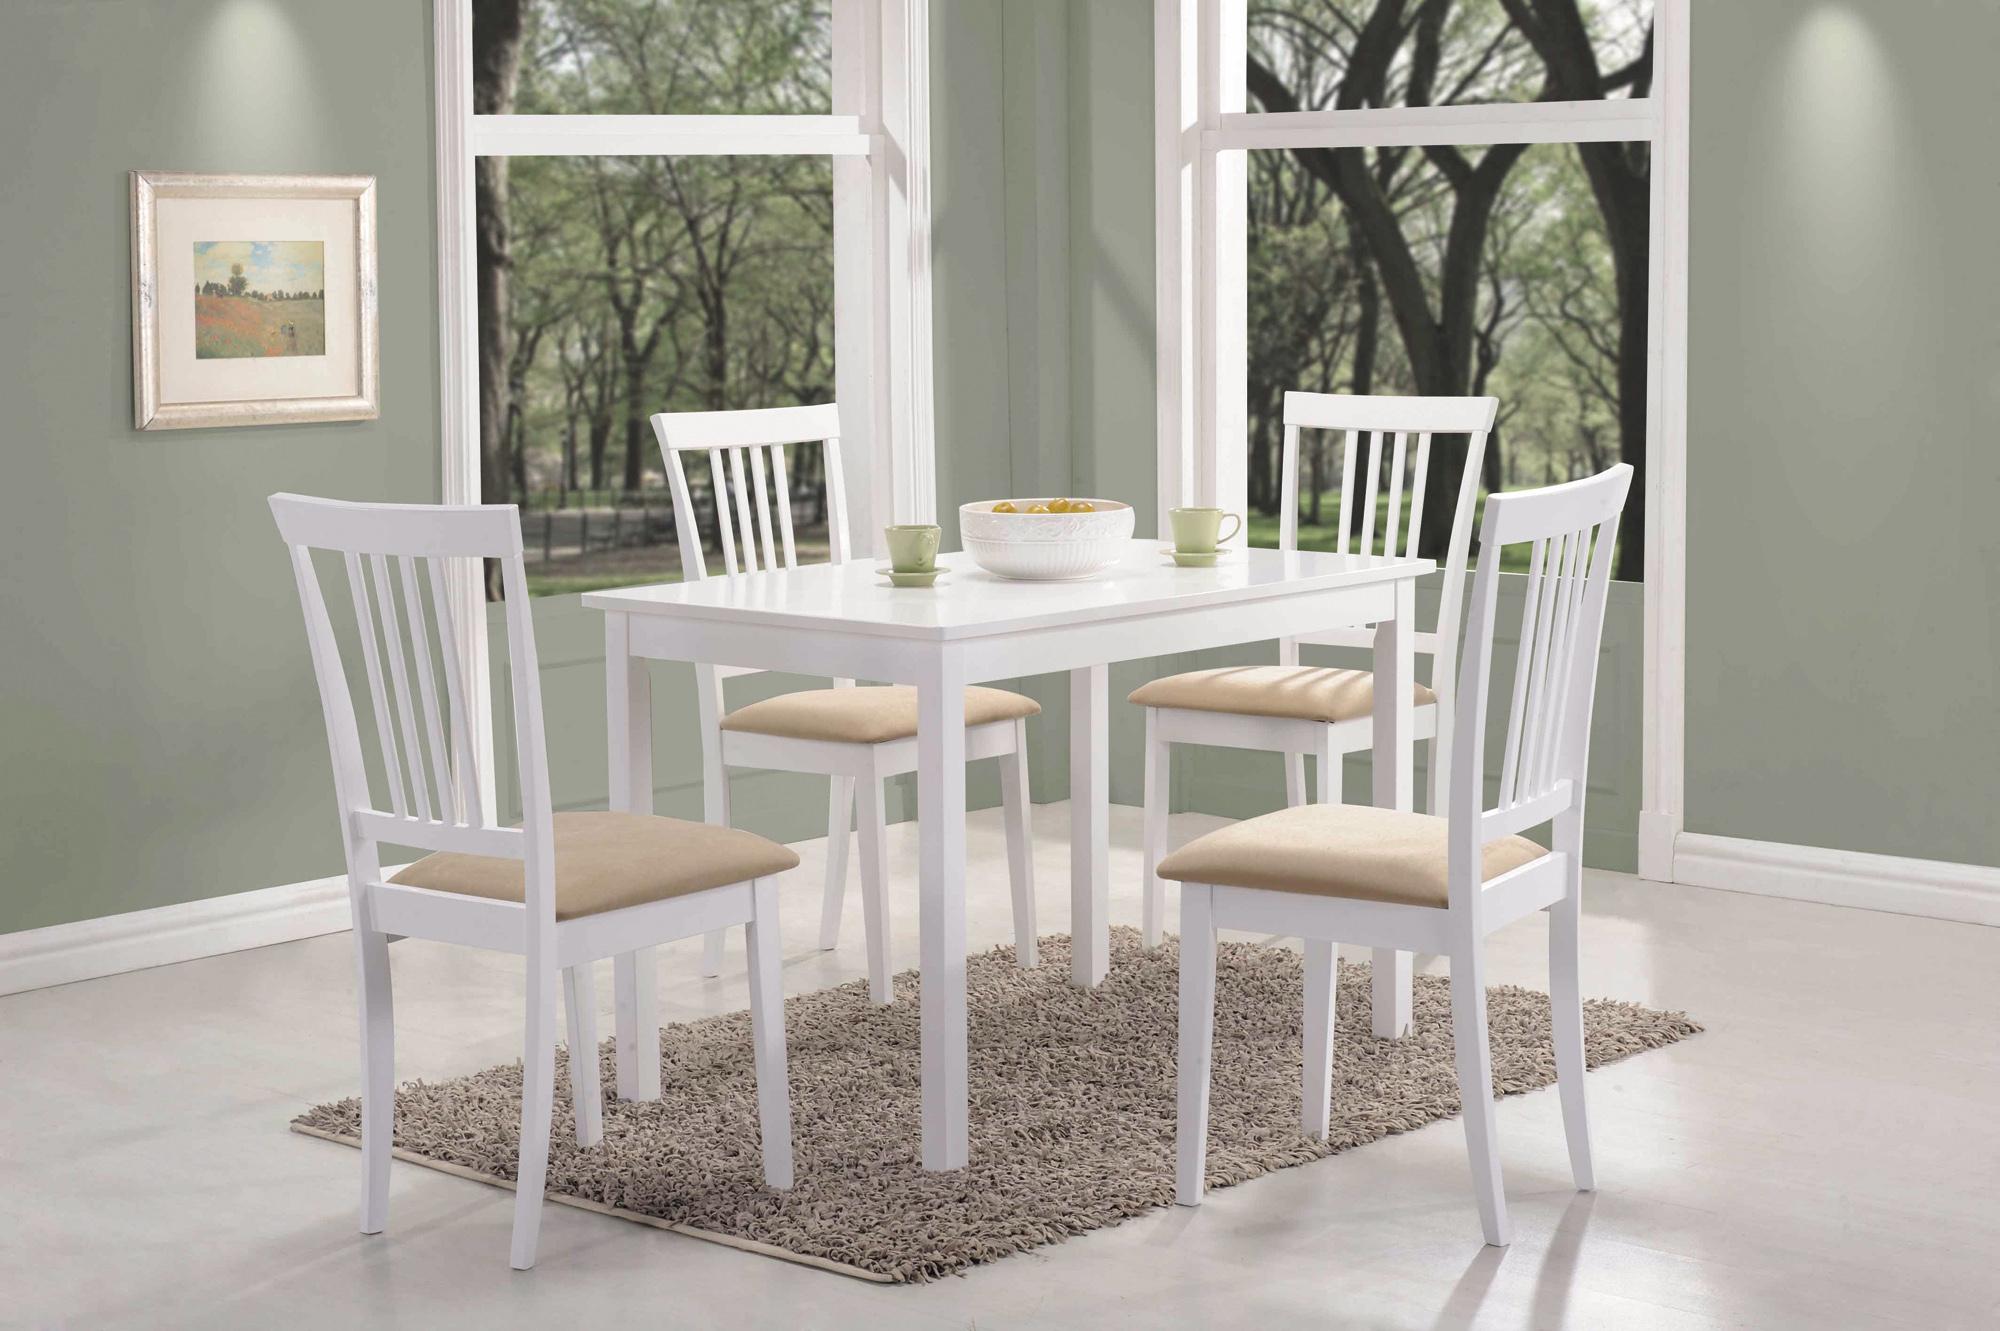 poze cu Set Masa Fiord Alba + 4 scaune